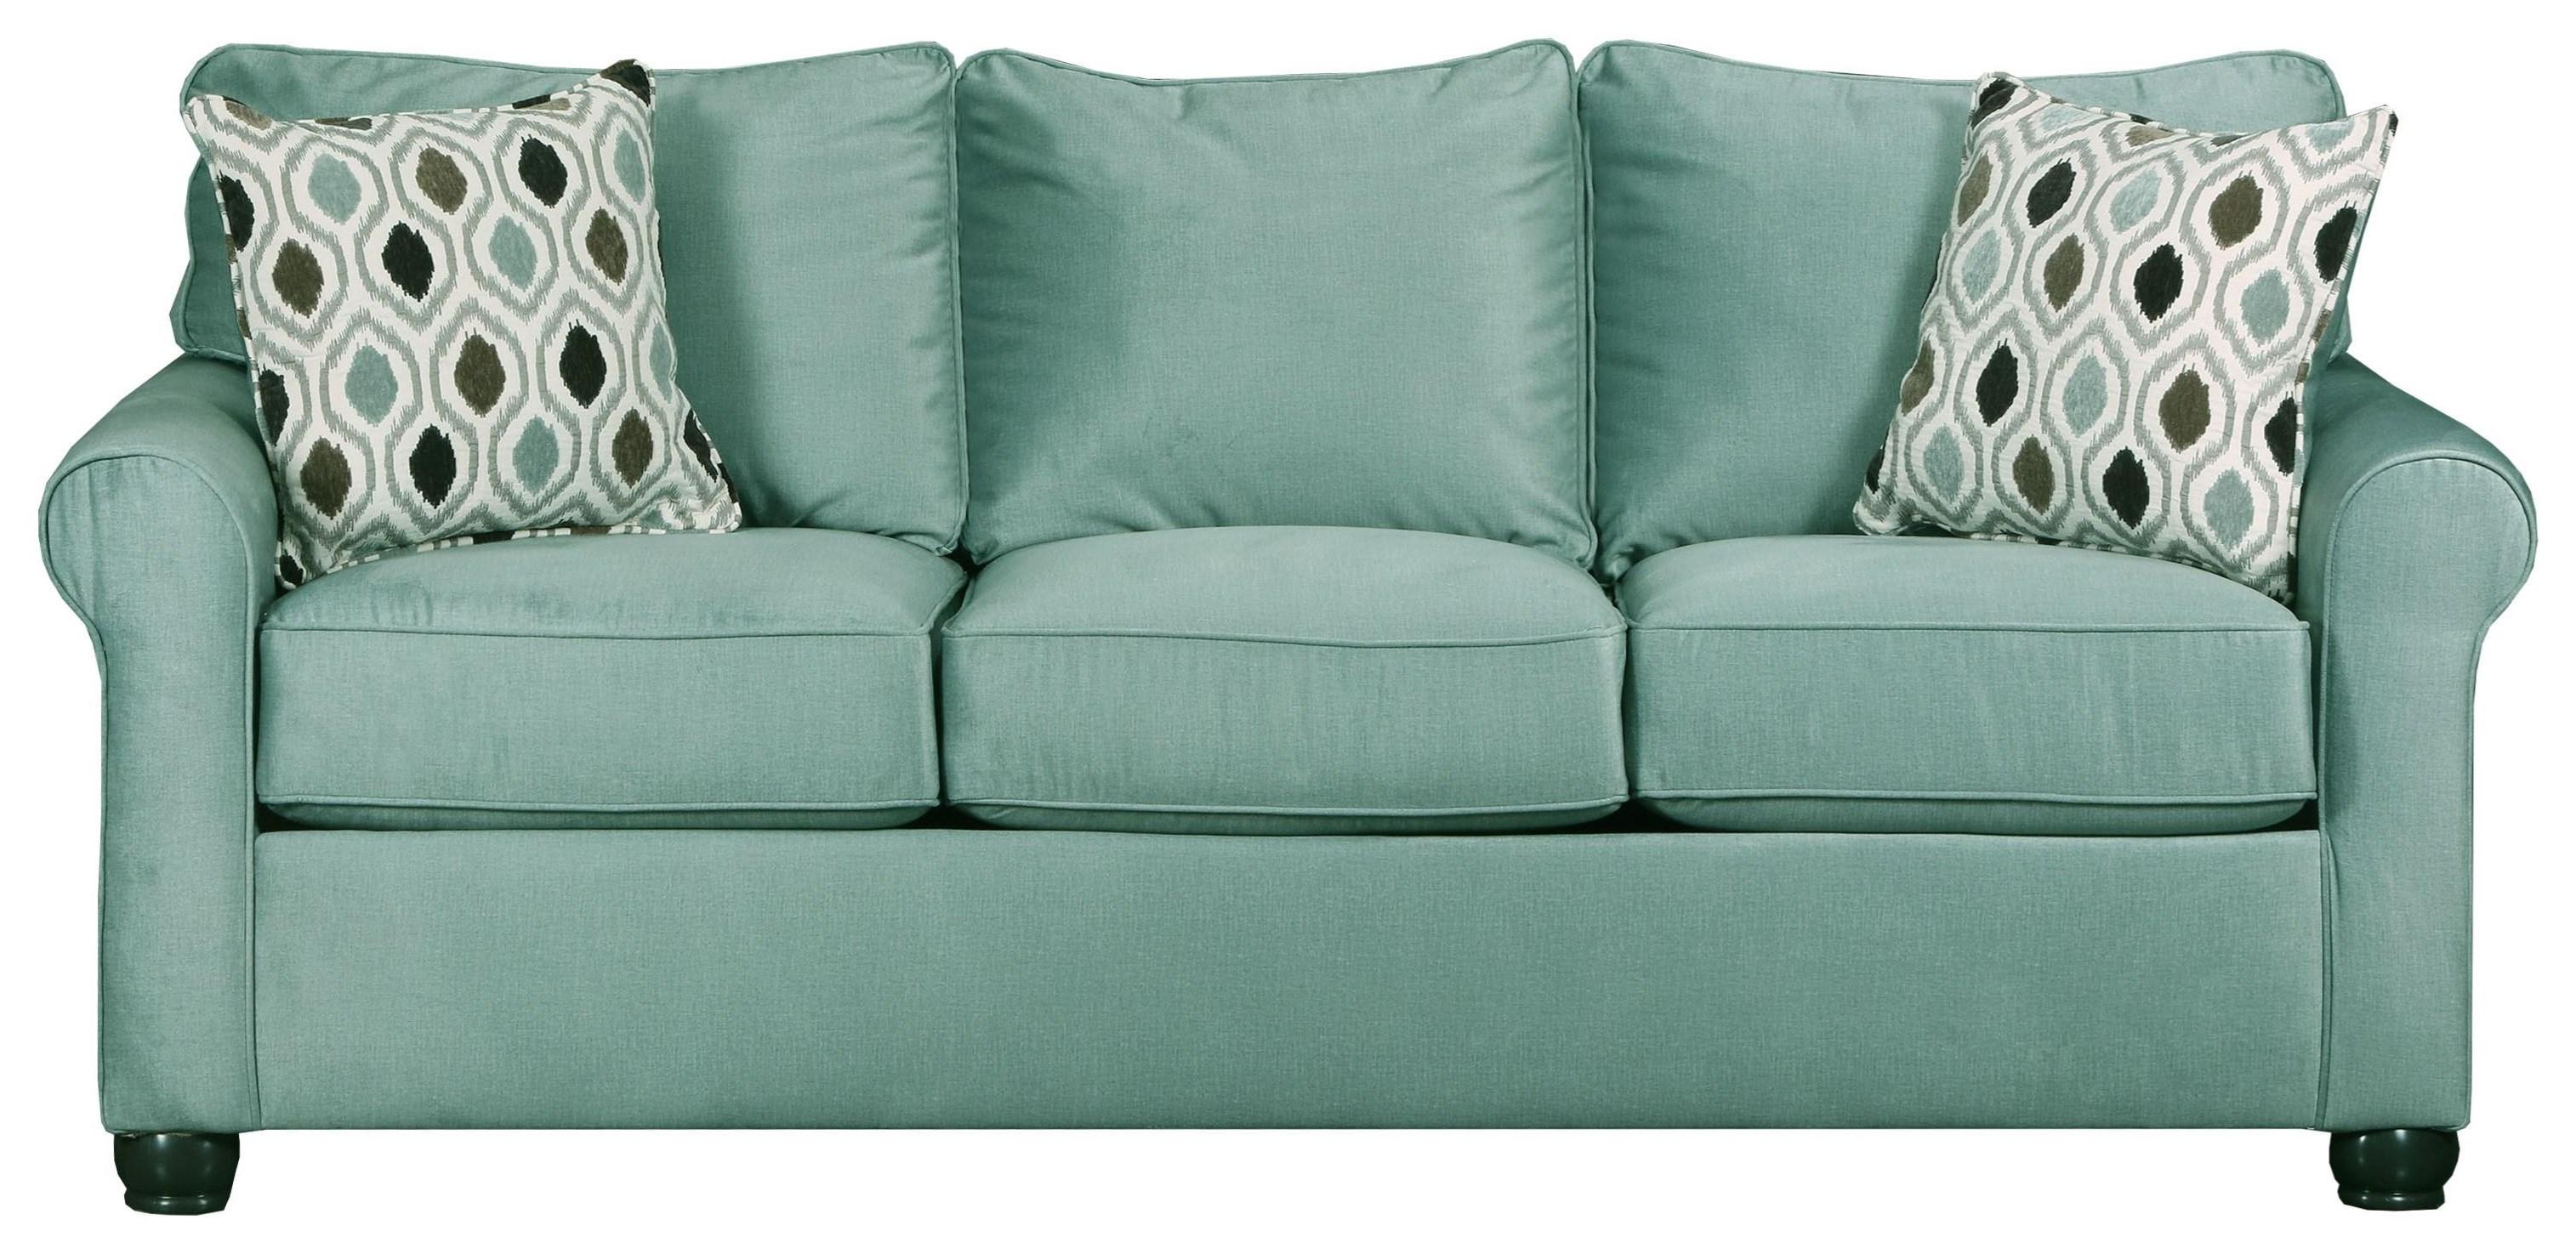 Three Seat Upholstered Sofa